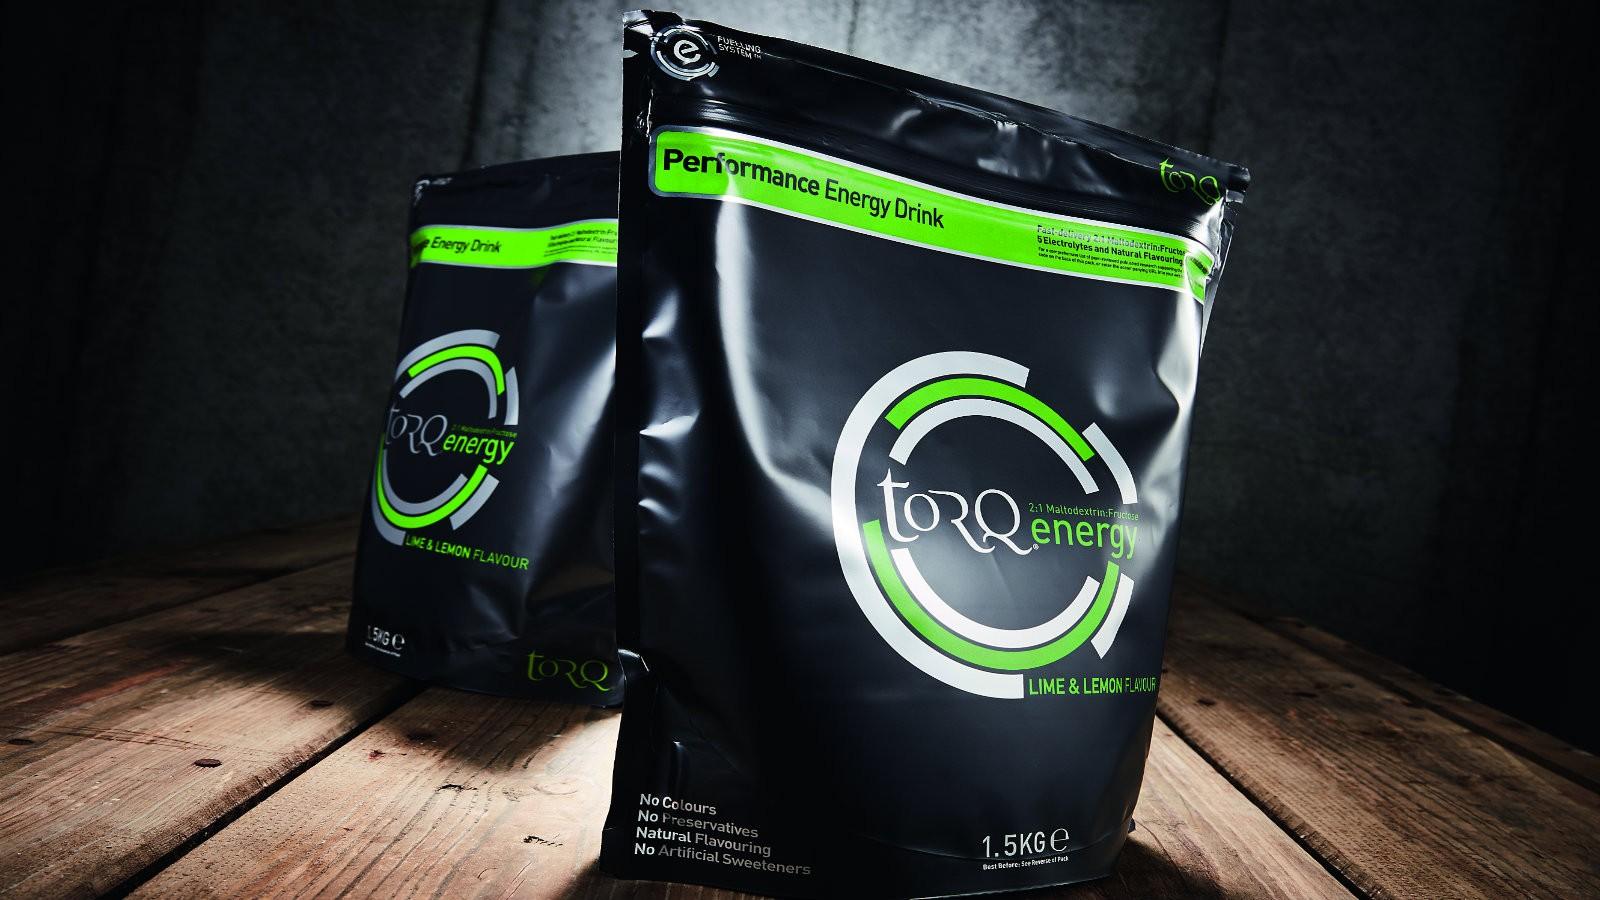 Torq energy drink pack